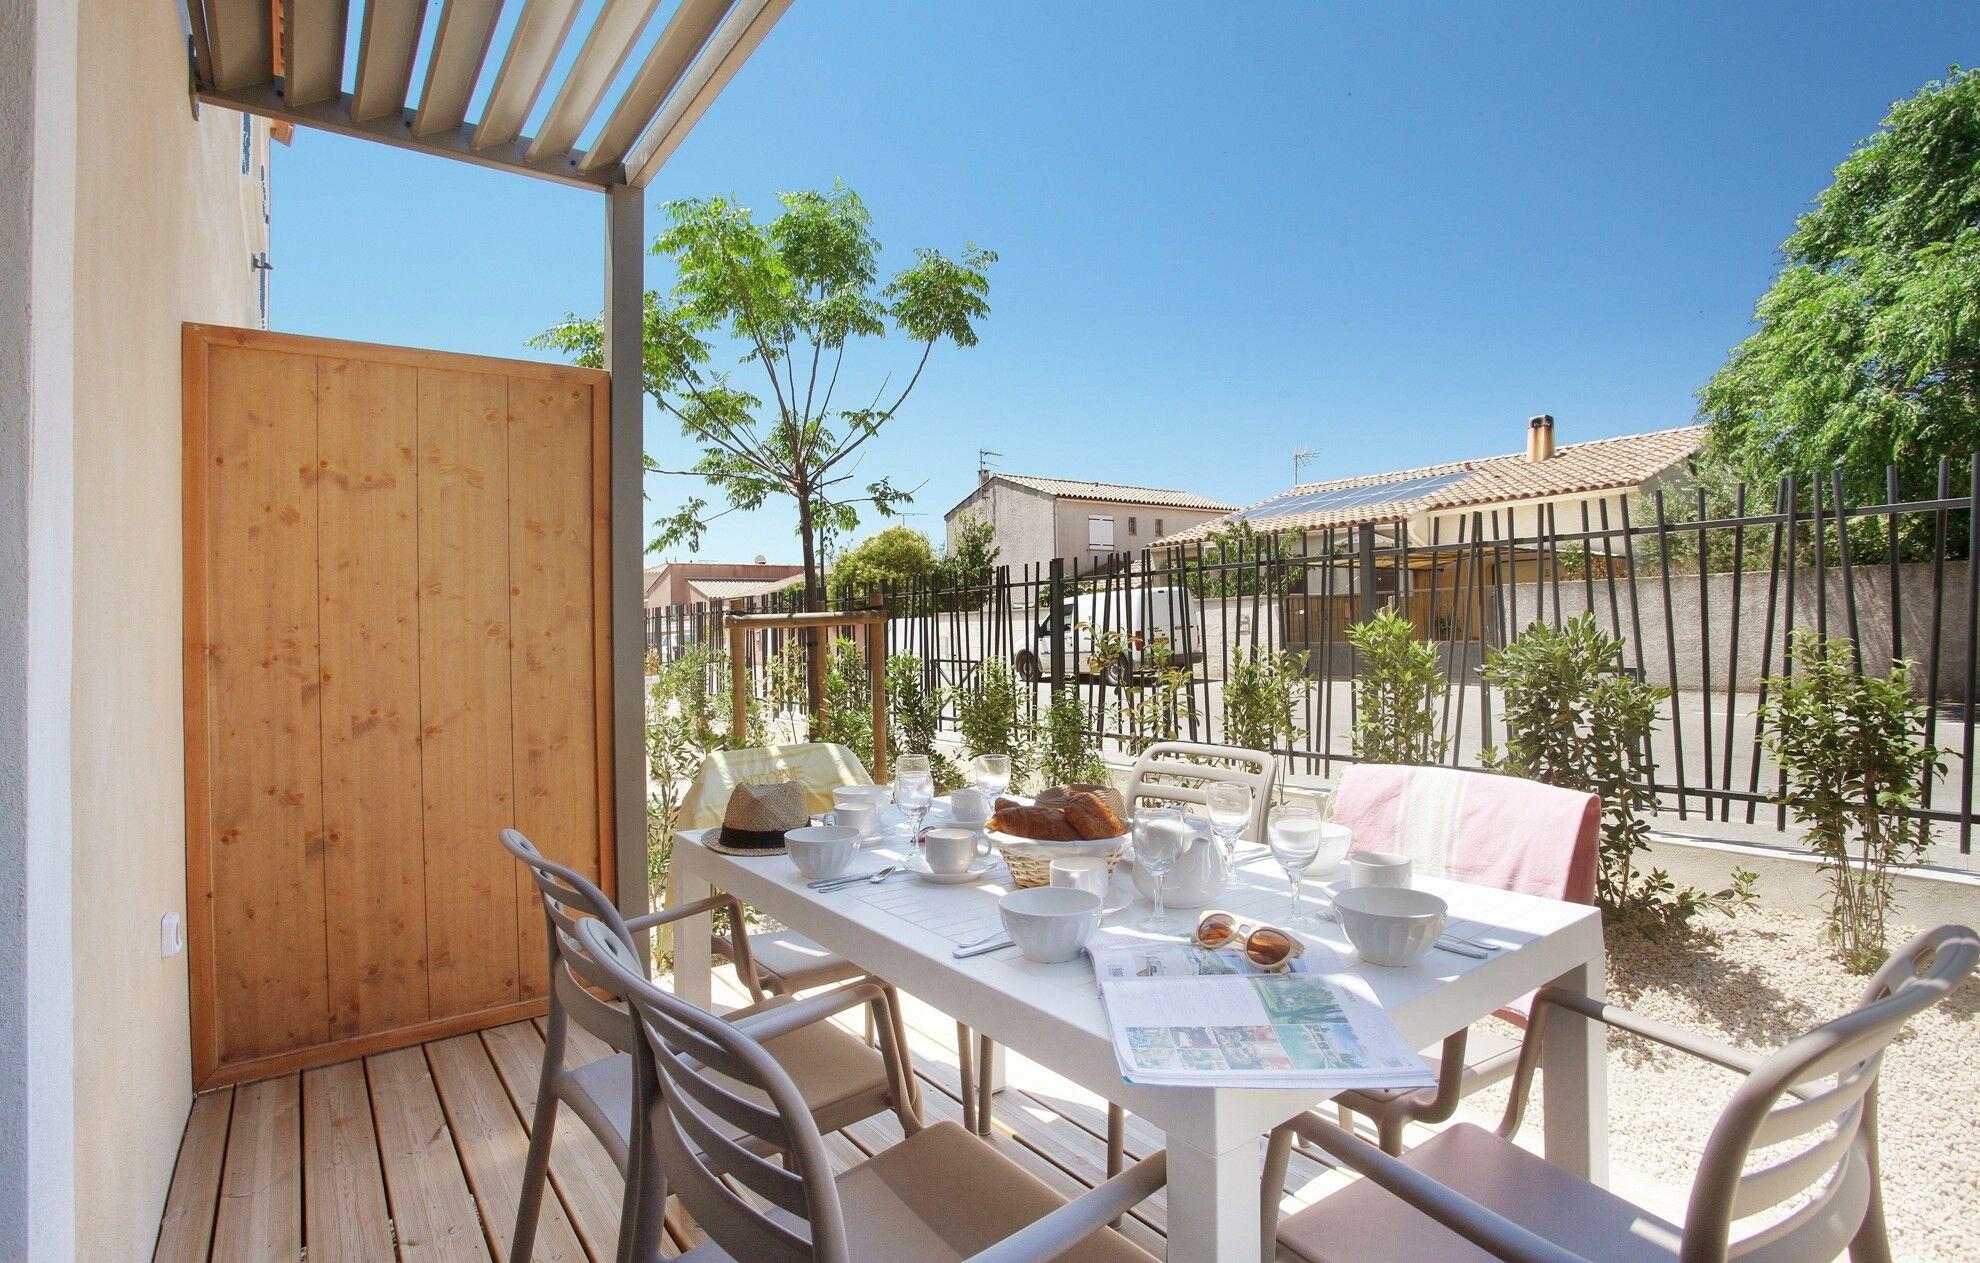 residence-fleur-de-sel-2p6p-terrace